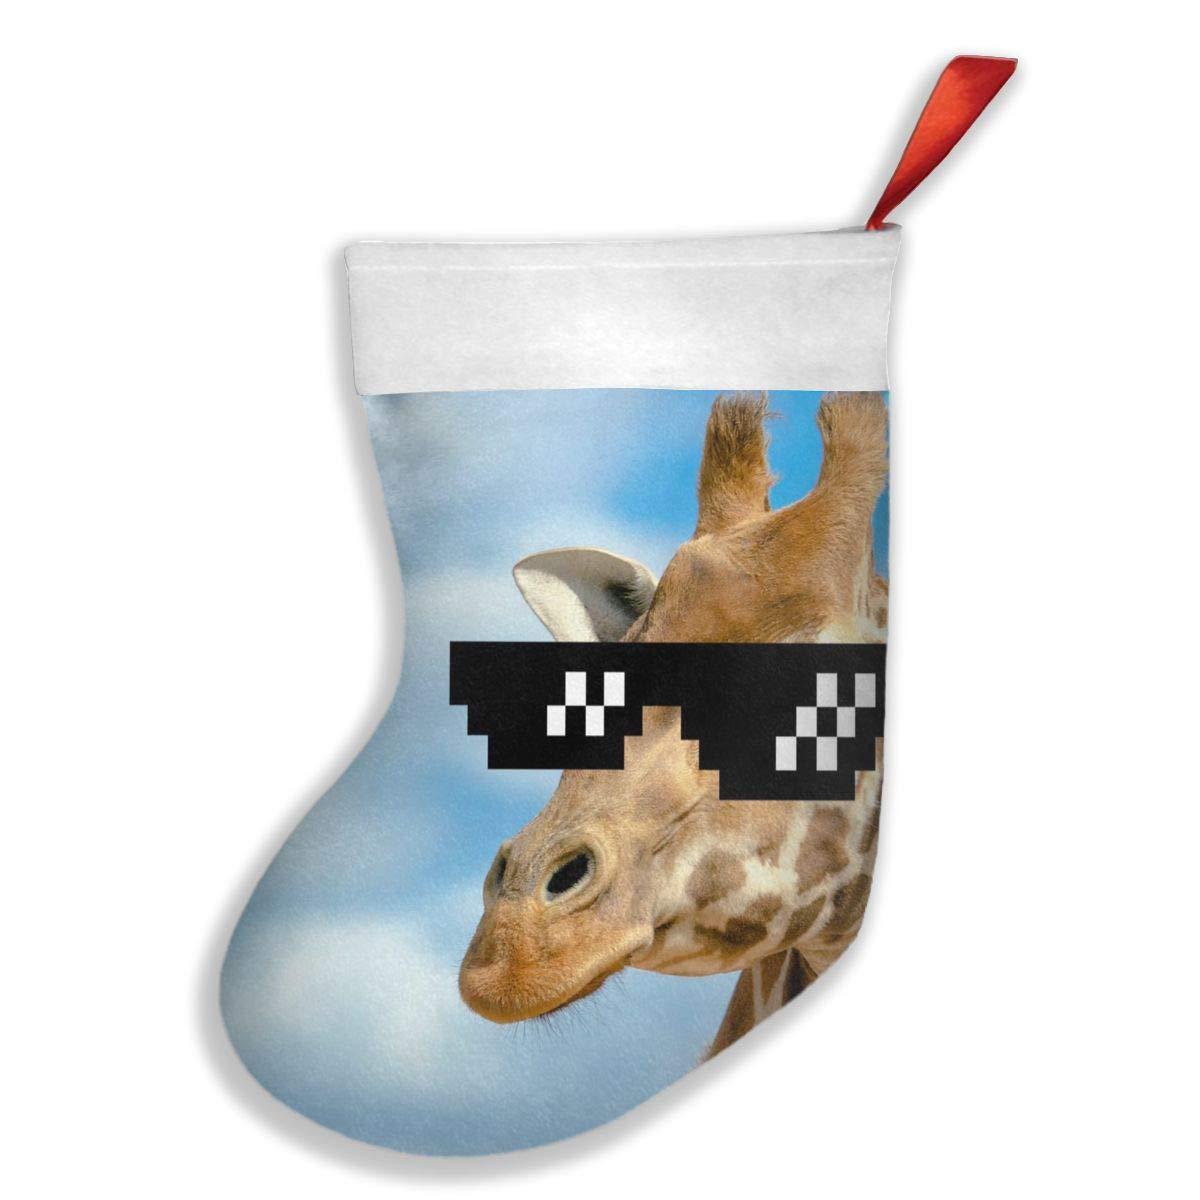 PO1 UP Sunglass Giraffes Christmas Holiday Stockings